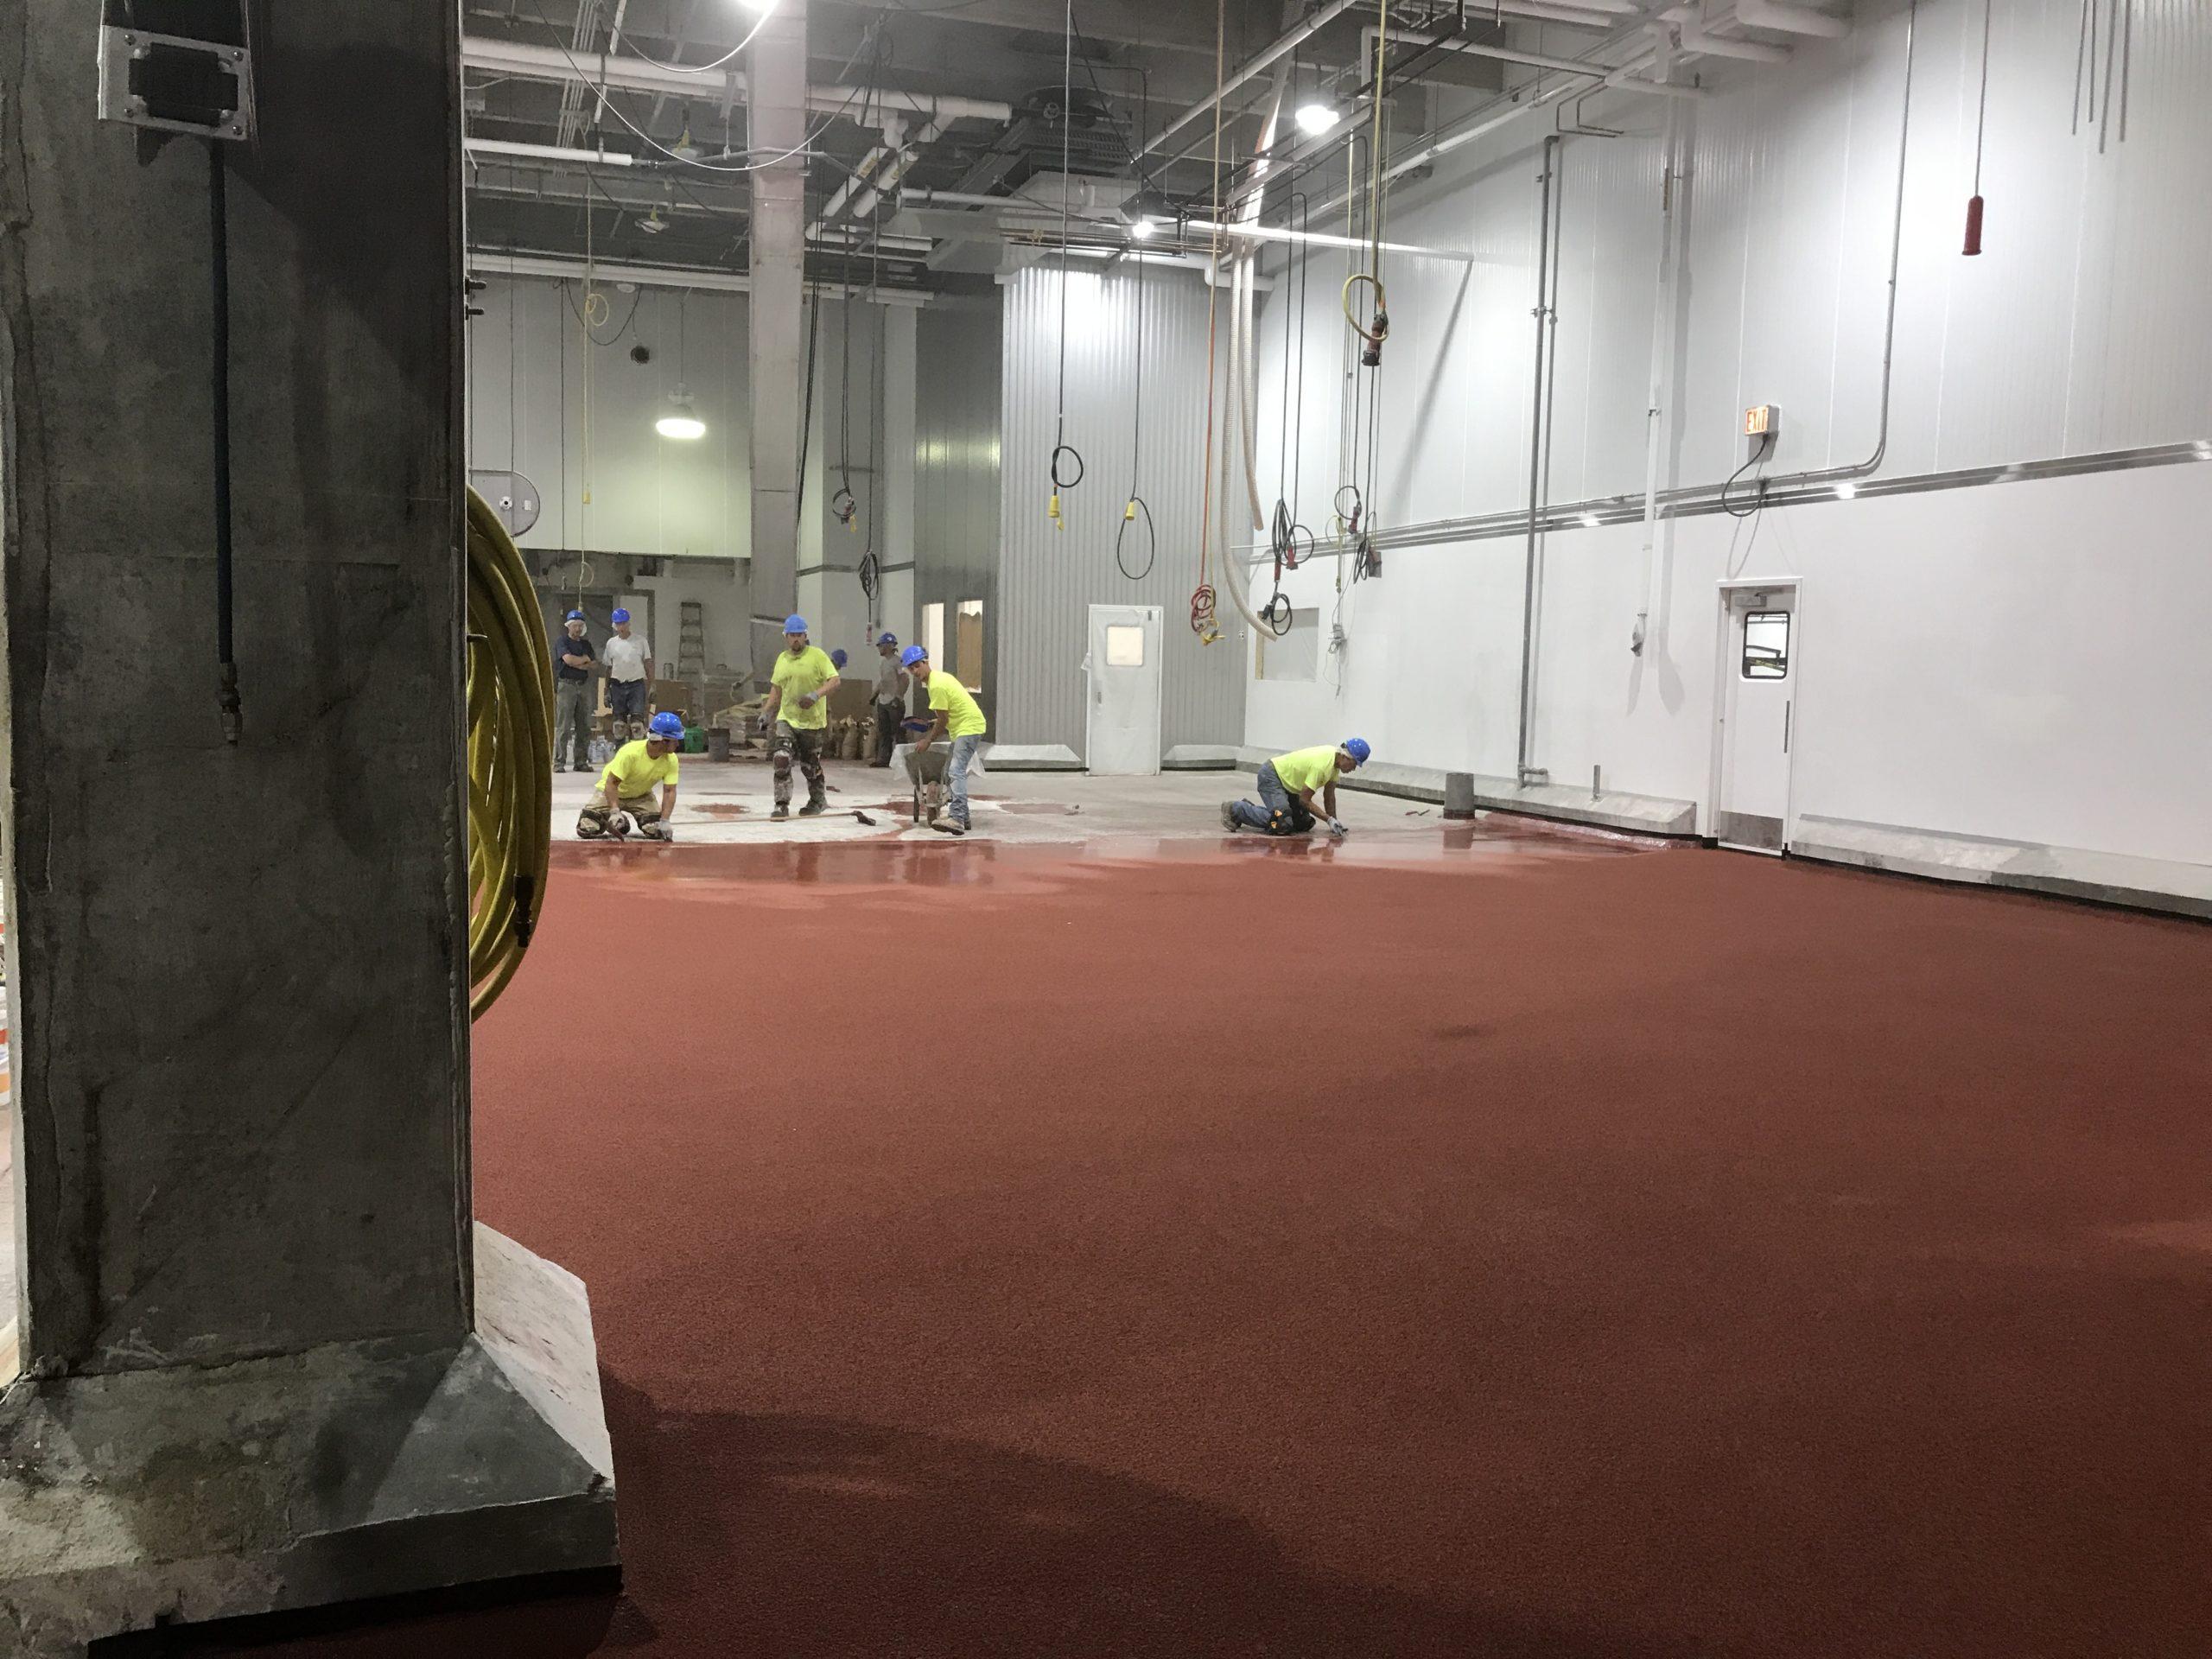 Urethane Cement Floor Installation (Industrial Flooring)